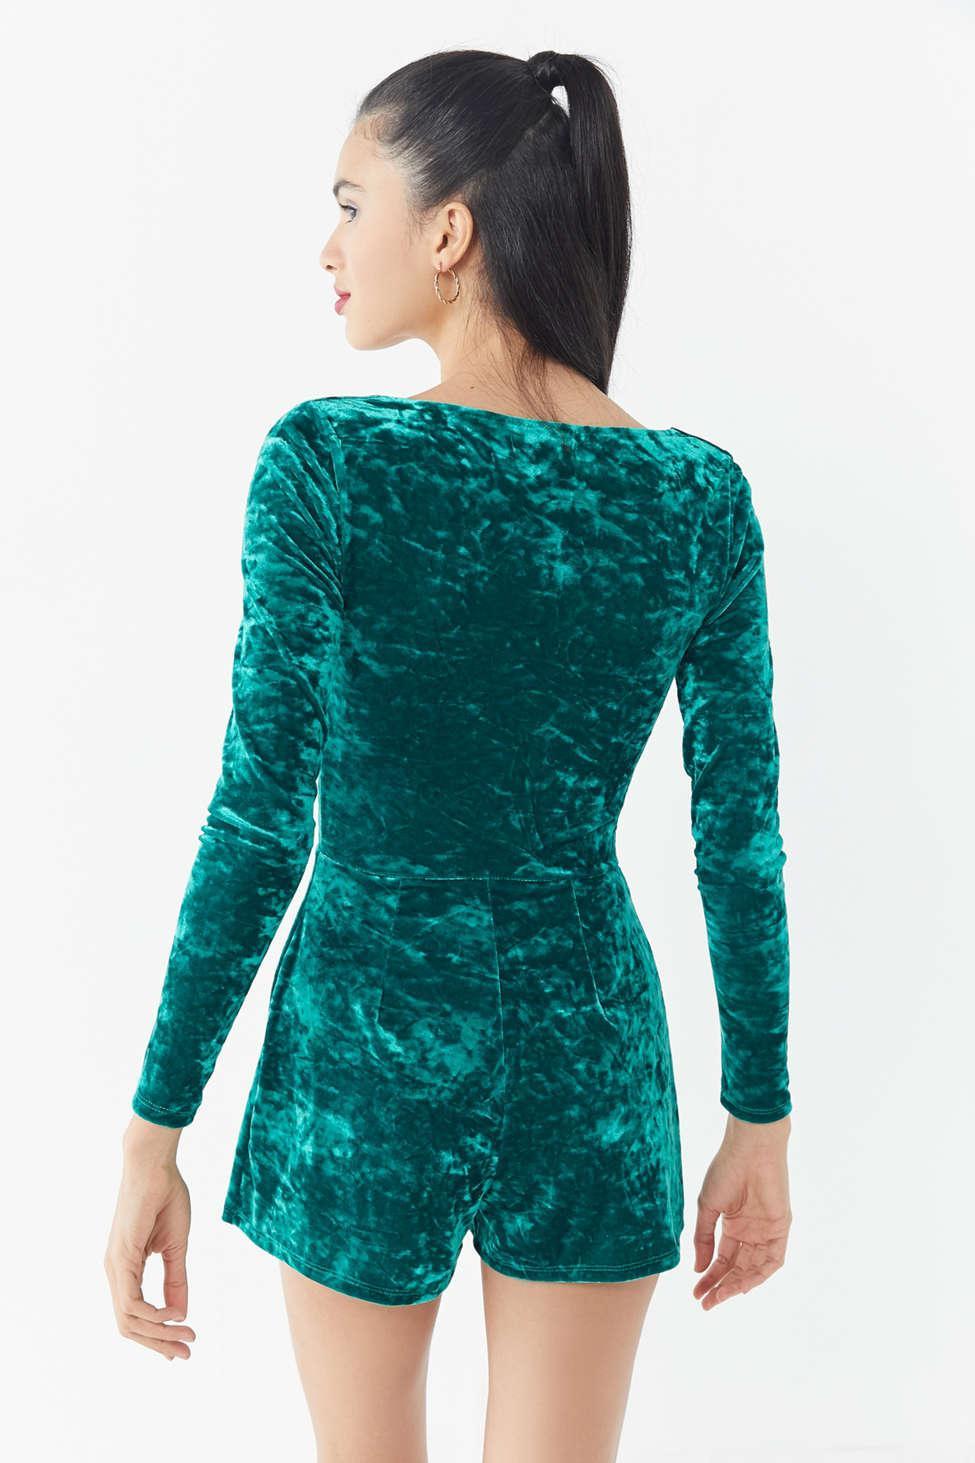 5e695c535759 Urban Outfitters - Green Uo Sasha Crushed Velvet Romper - Lyst. View  fullscreen